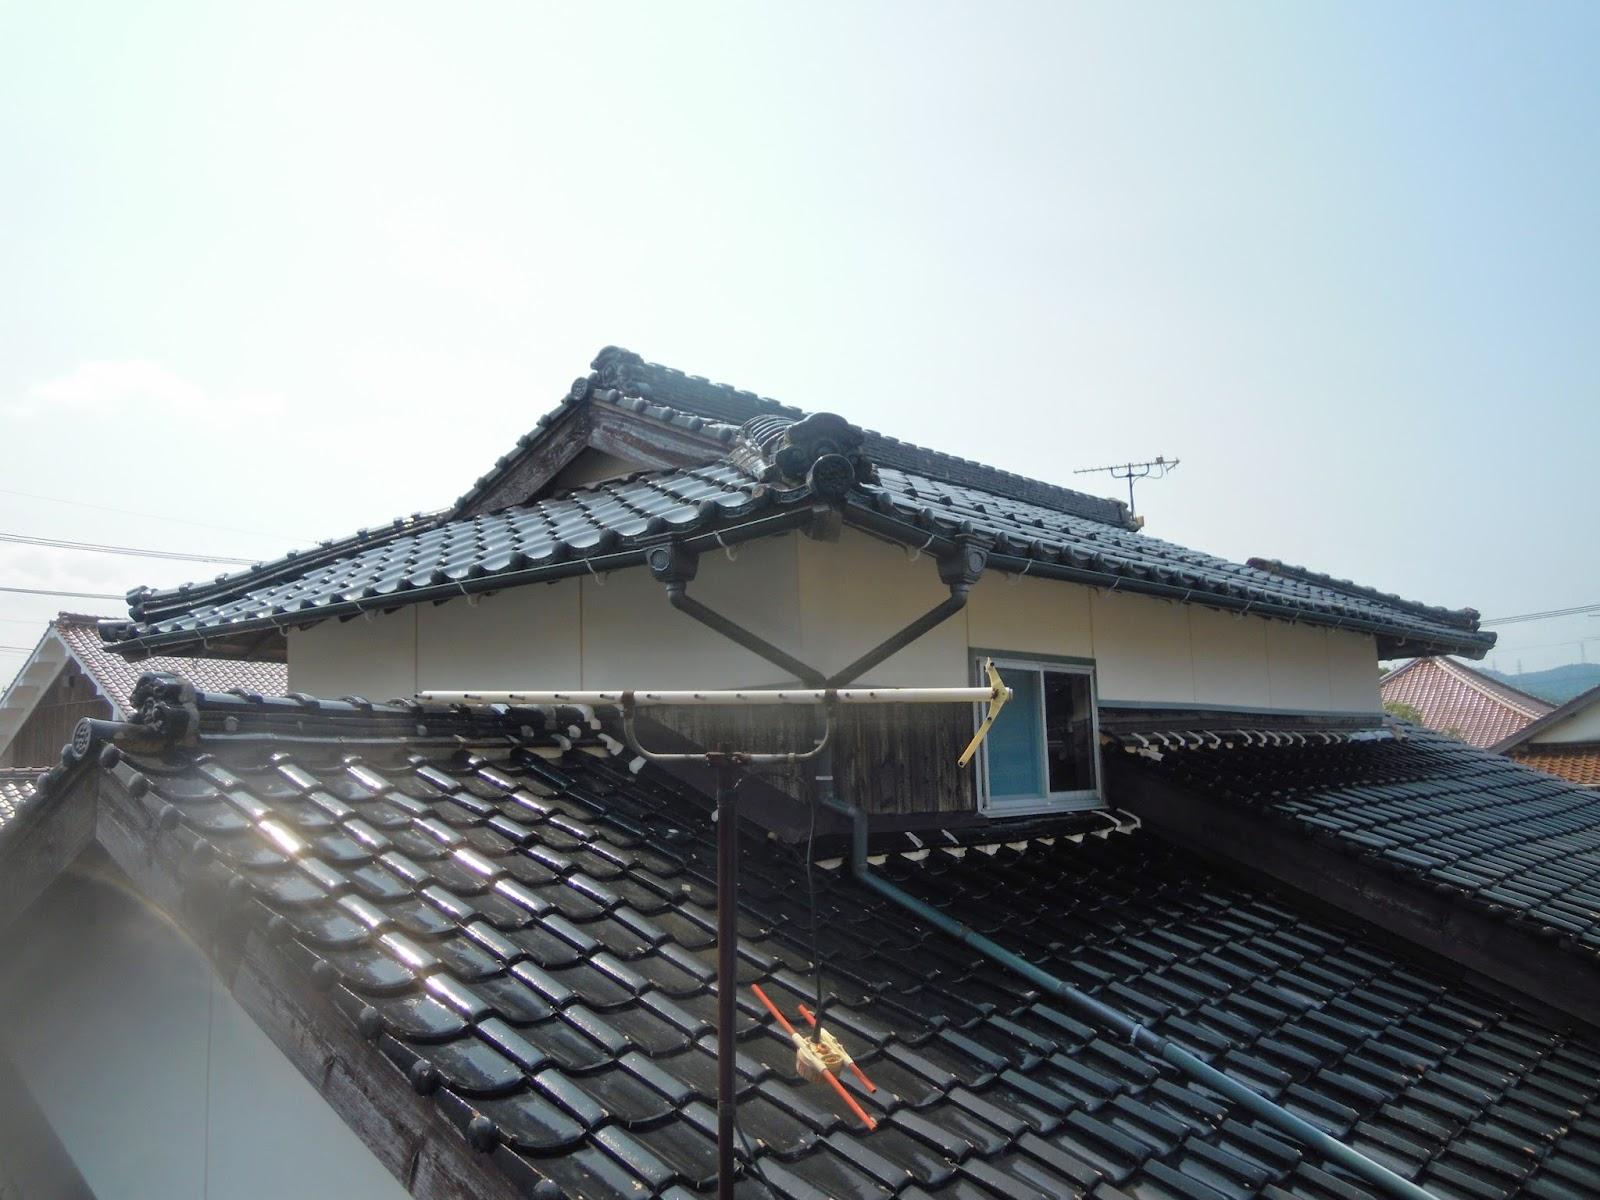 屋根替え 瓦葺き替え 島根県 浜松建設株式会社